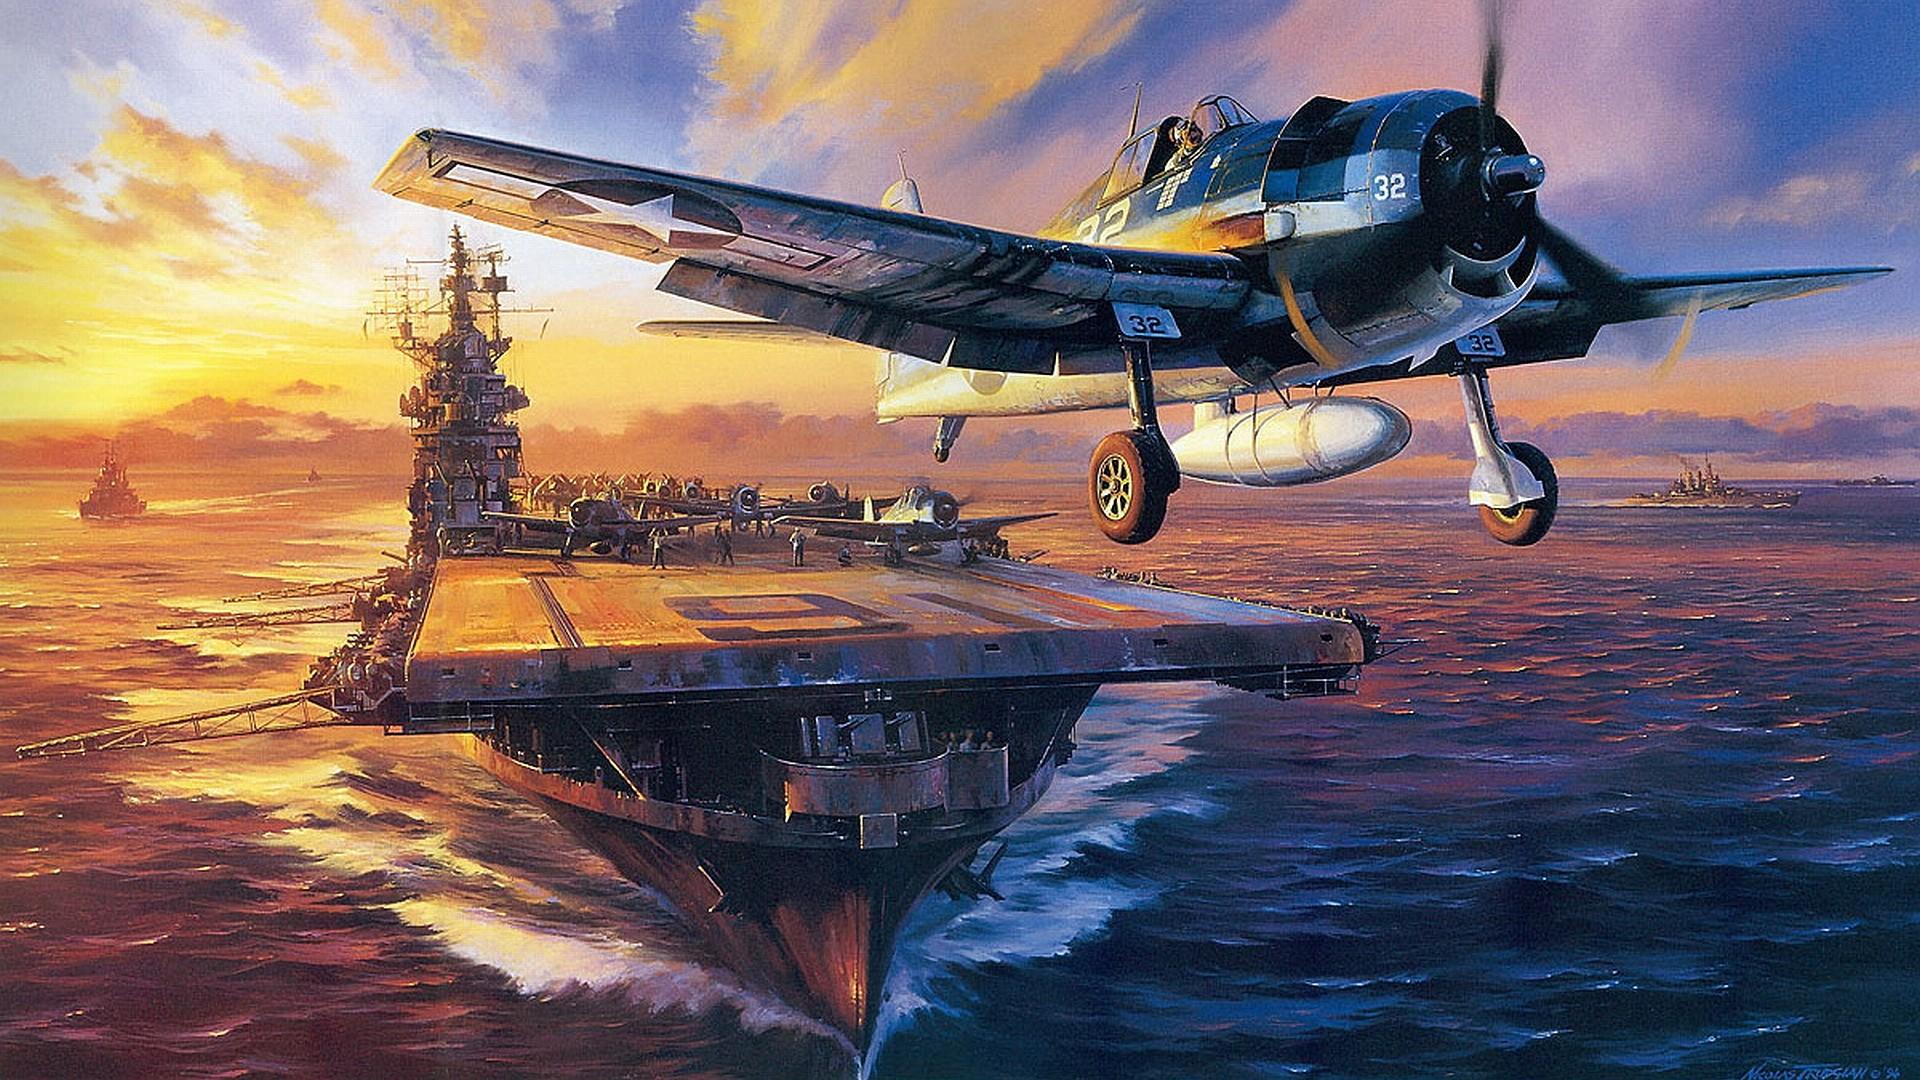 war plane wallpaper (79+ images)